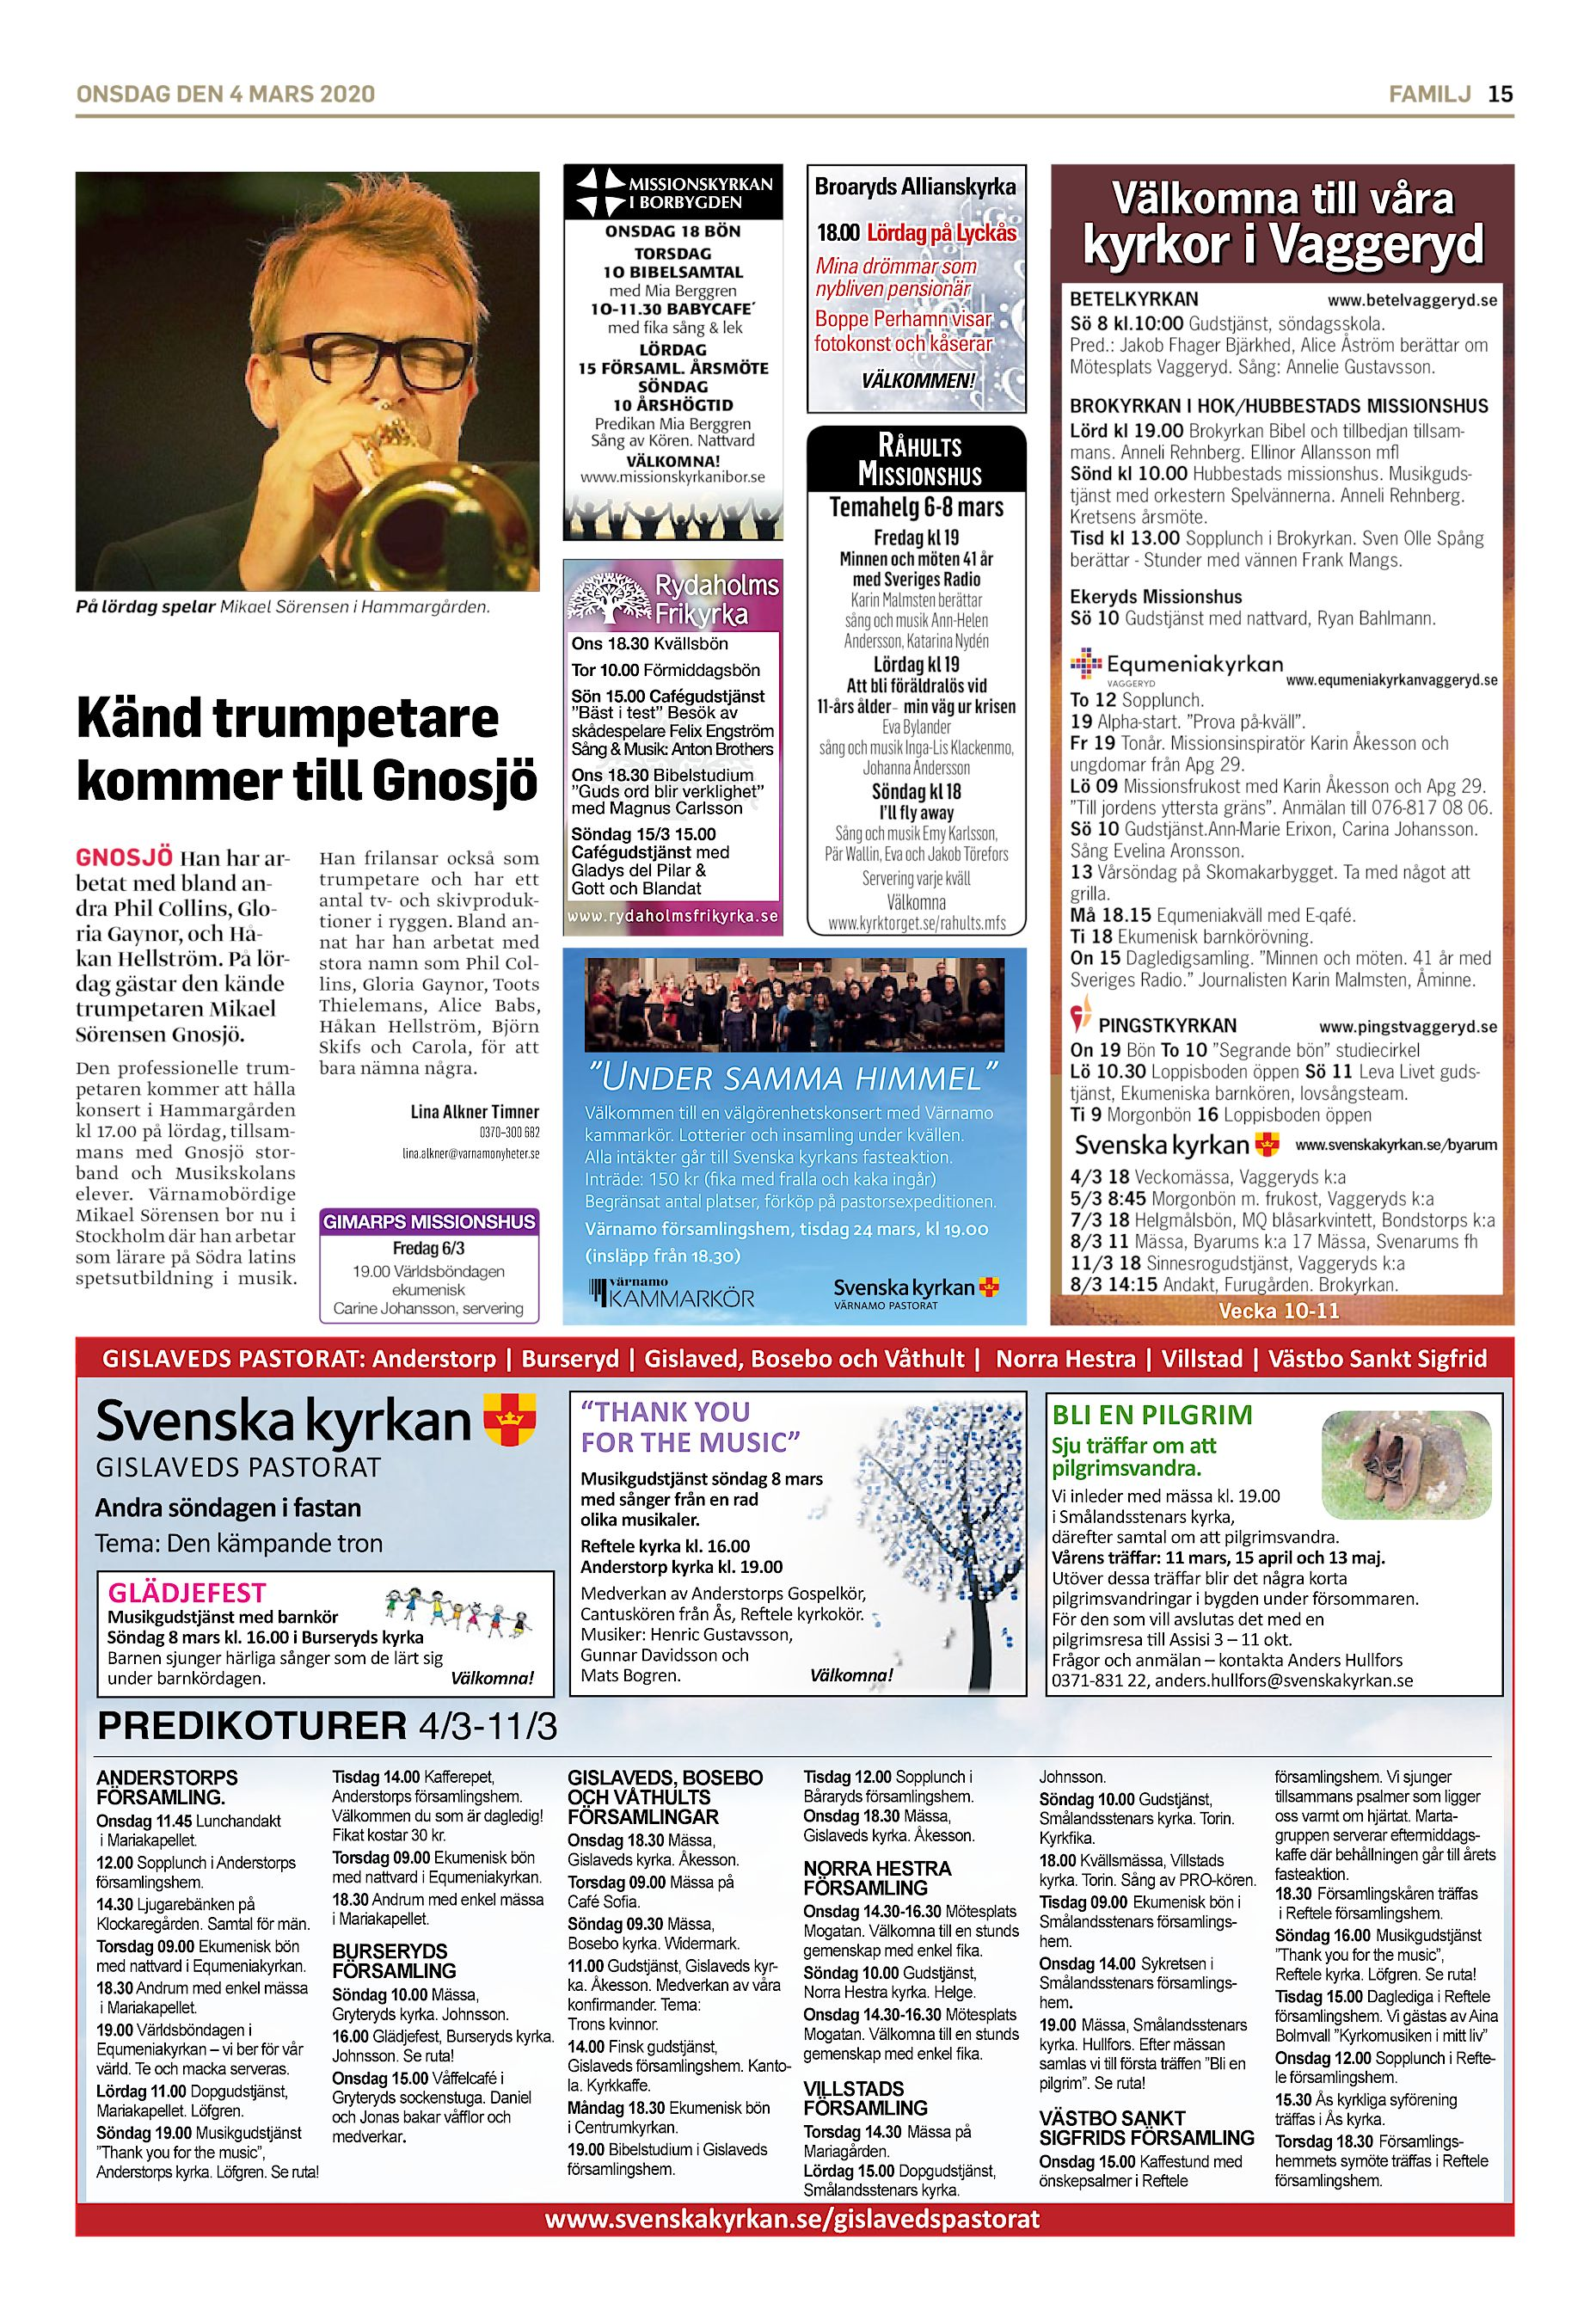 Auste Pundziute Lyck, Gavelsvgen 20, Partille | satisfaction-survey.net